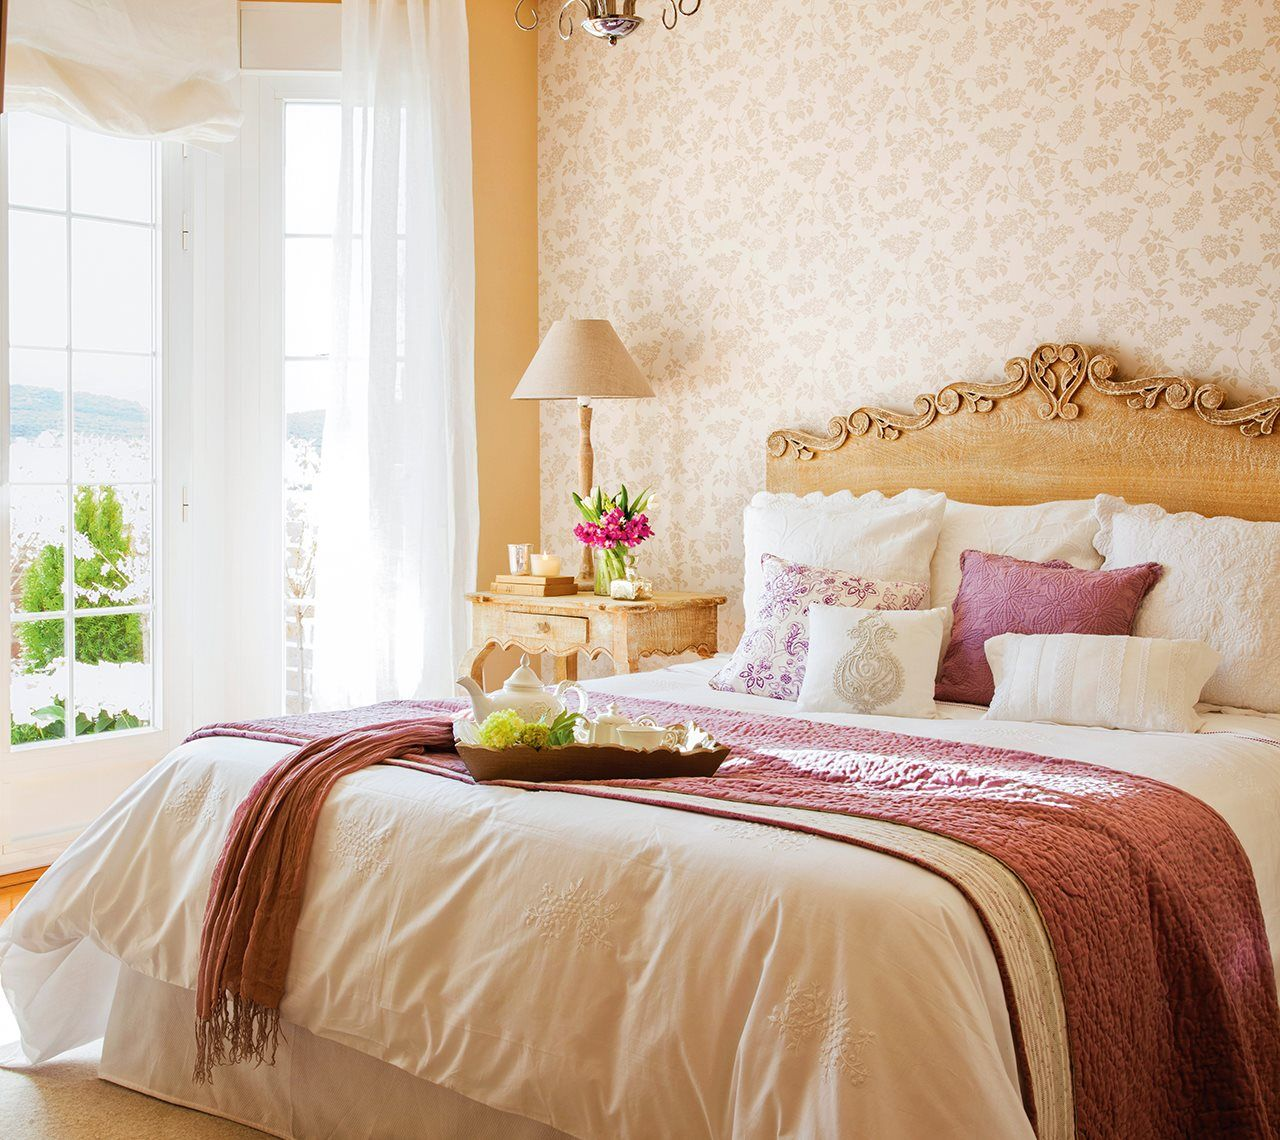 Las mejores ideas para renovar tu dormitorio elmueble for Papel habitacion matrimonio